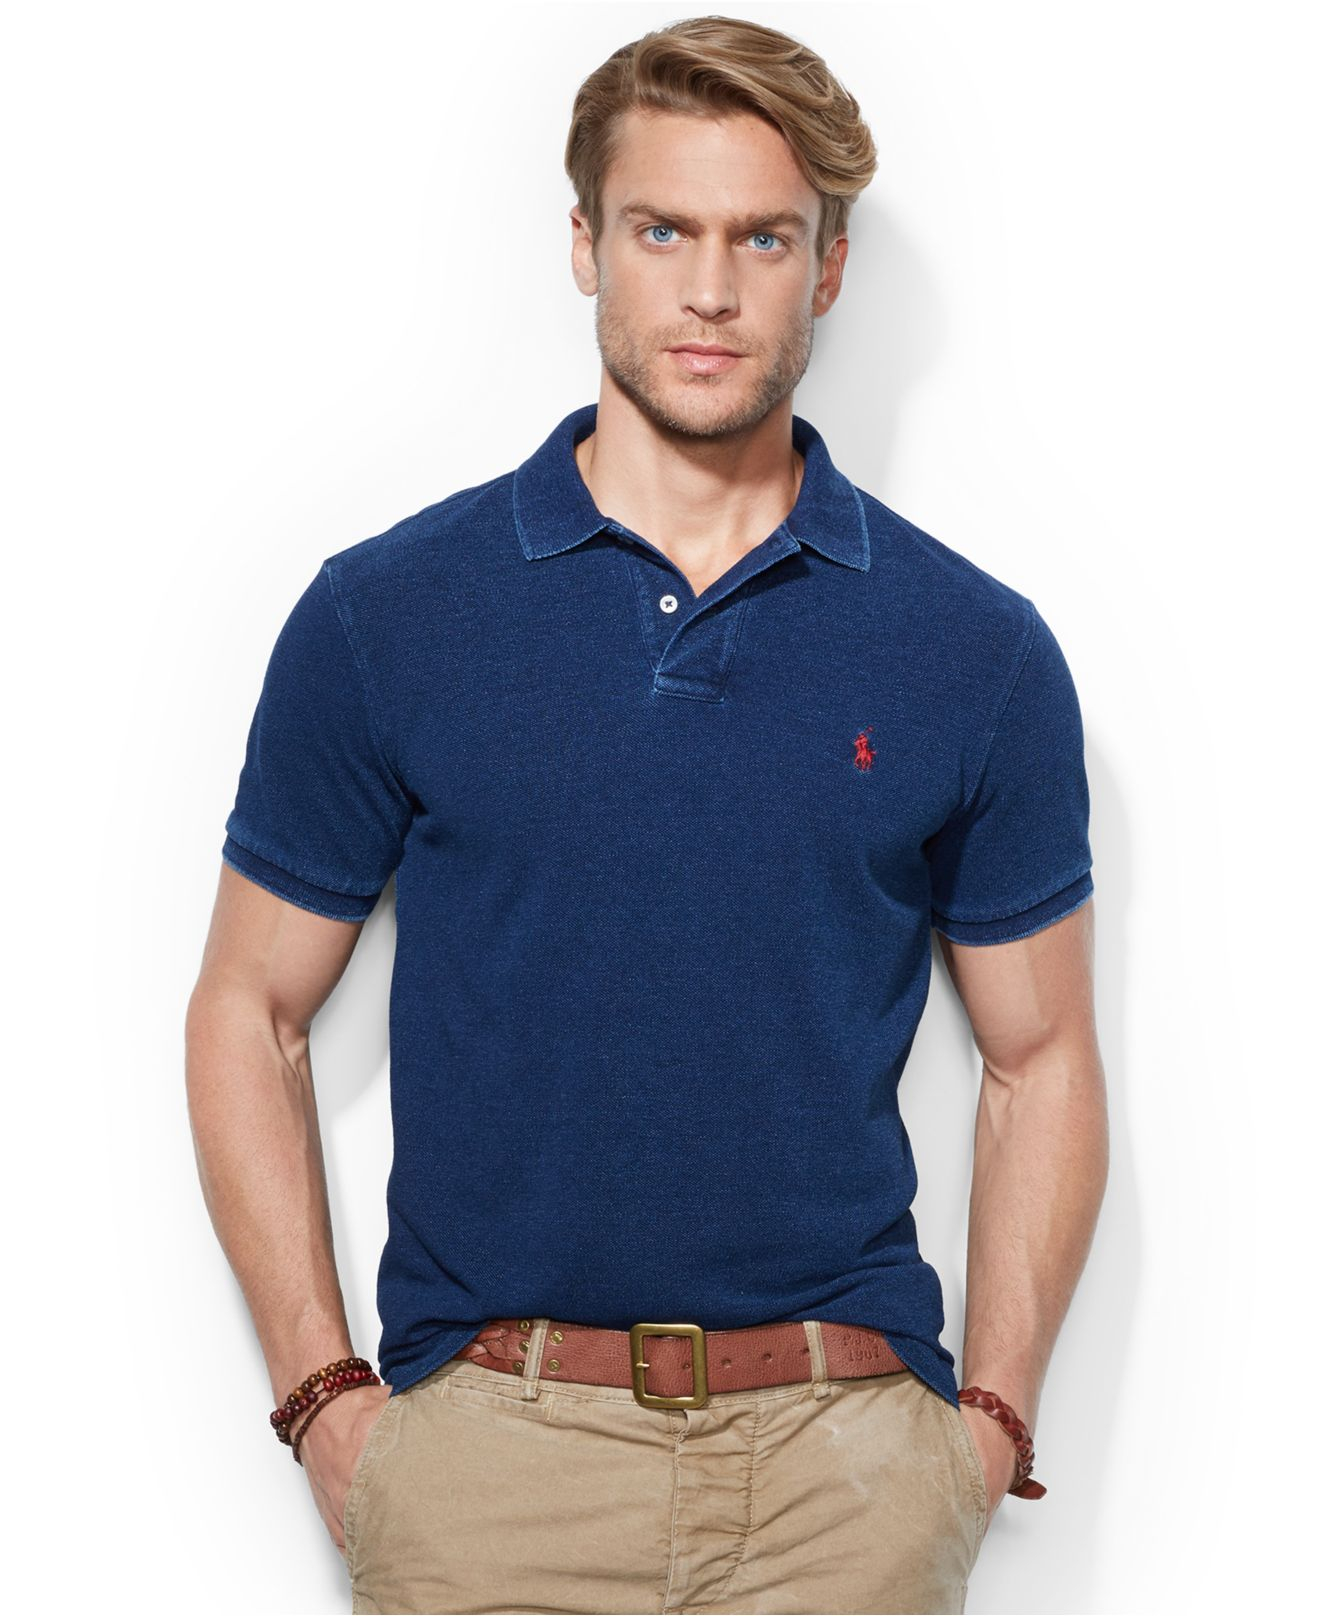 c5c9786f65663 Lyst - Polo Ralph Lauren Custom-fit Mesh Indigo Polo in Blue for Men